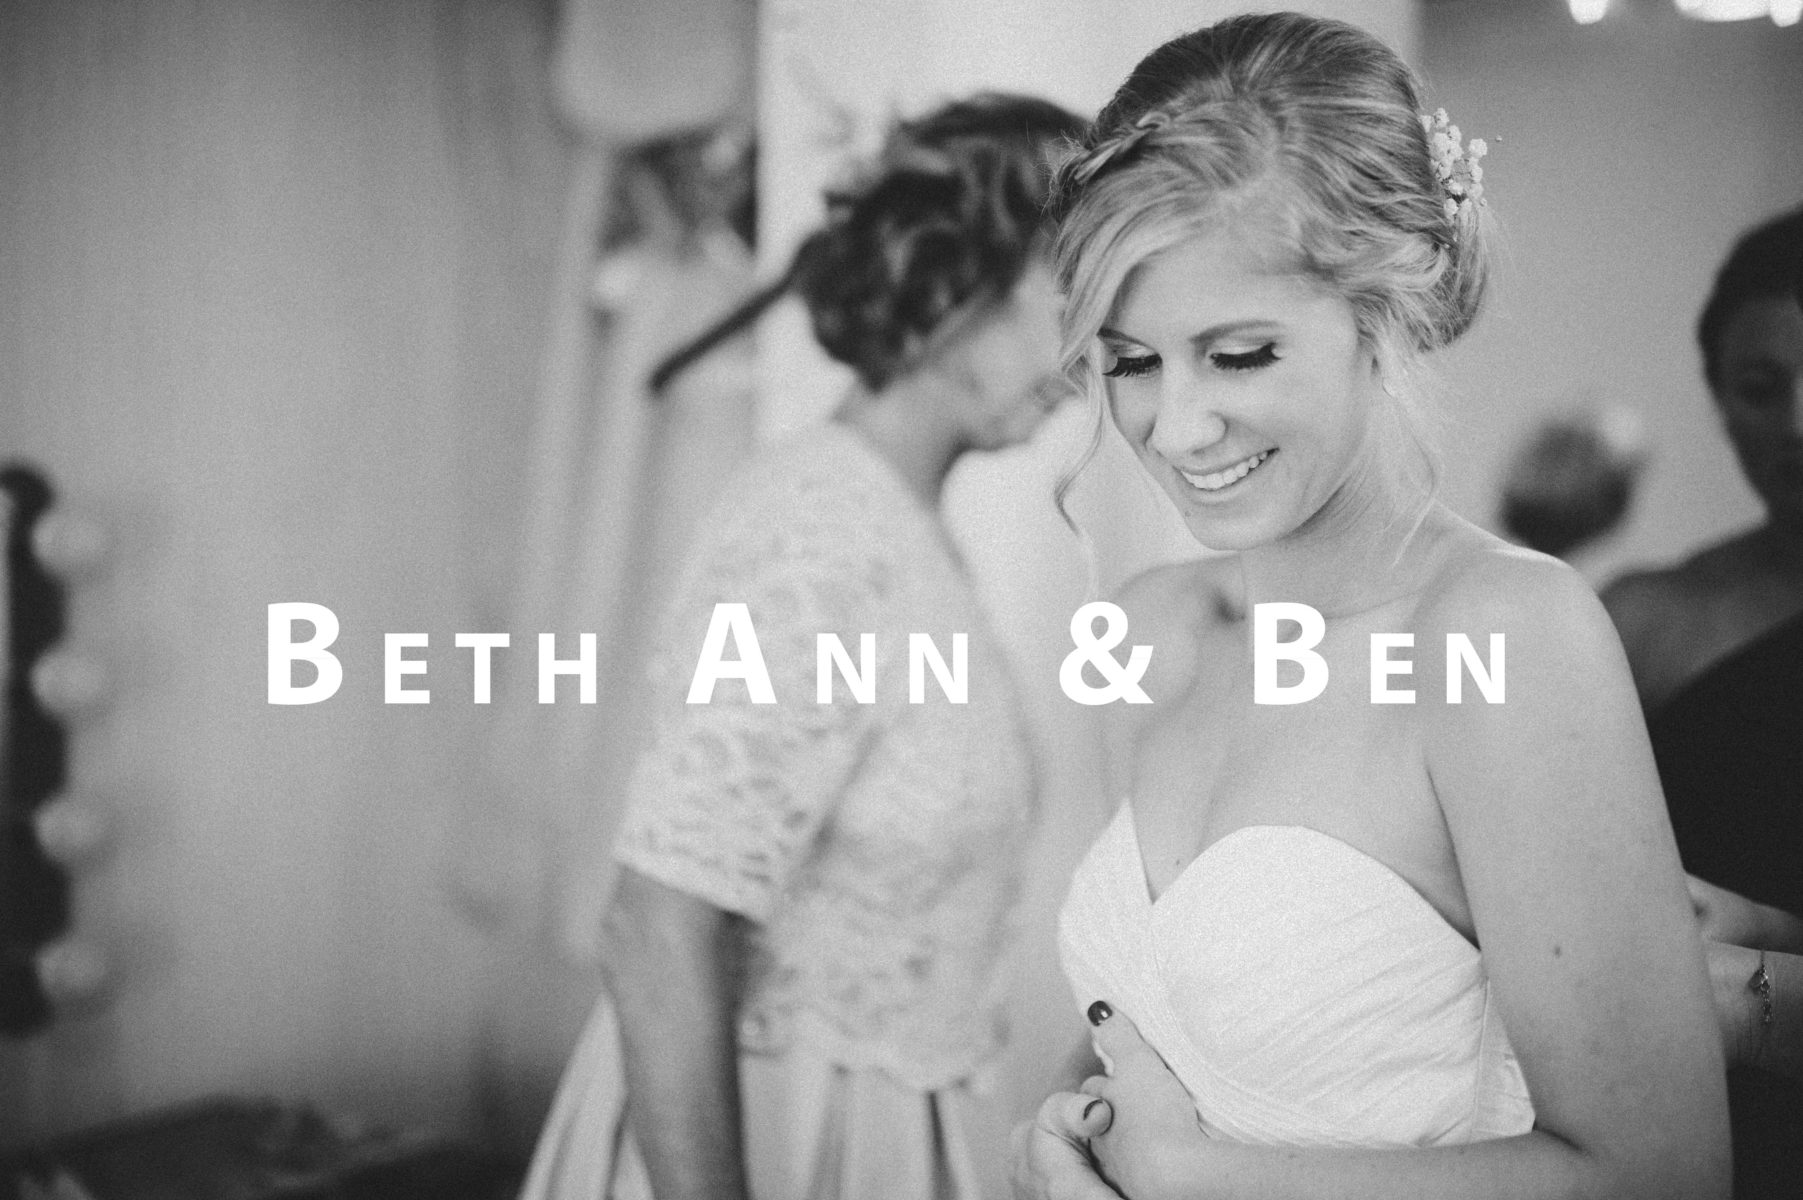 vBEST WEDDING PHOTOGRAPHER in WISCONSIN, Clear Tent Wedding, White Tent Wedding, Madison Wisconsin Wedding